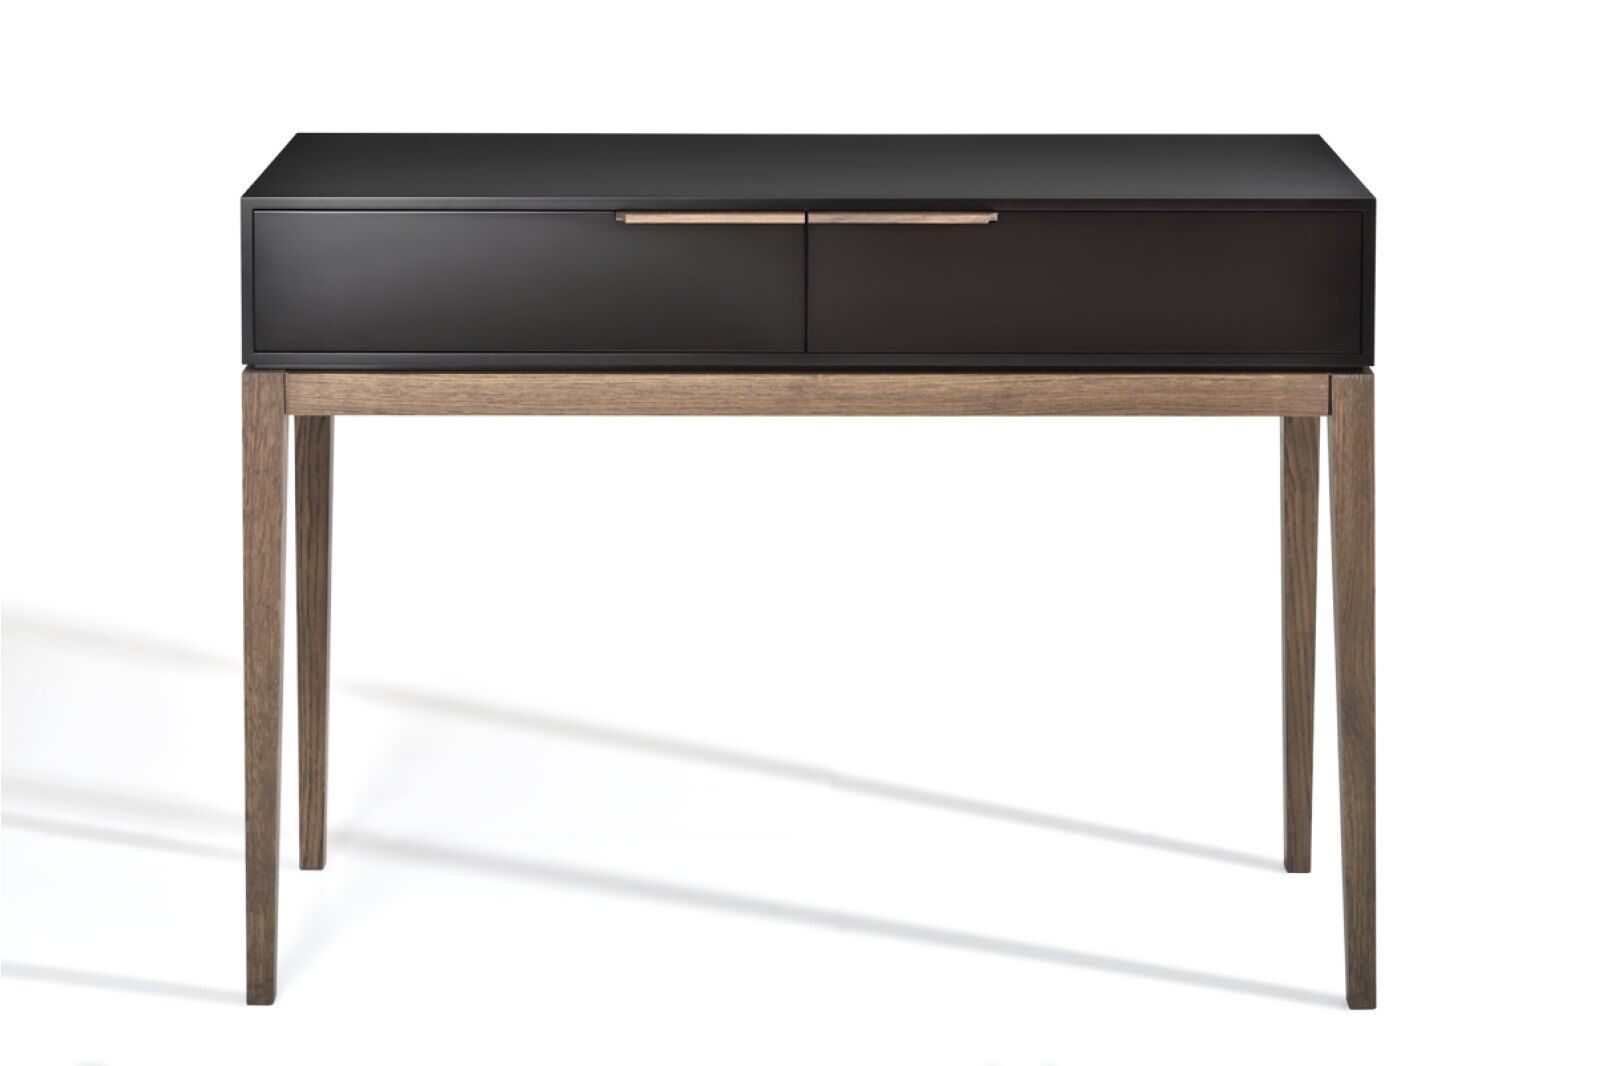 Malibu Console Table 120cm  / 1